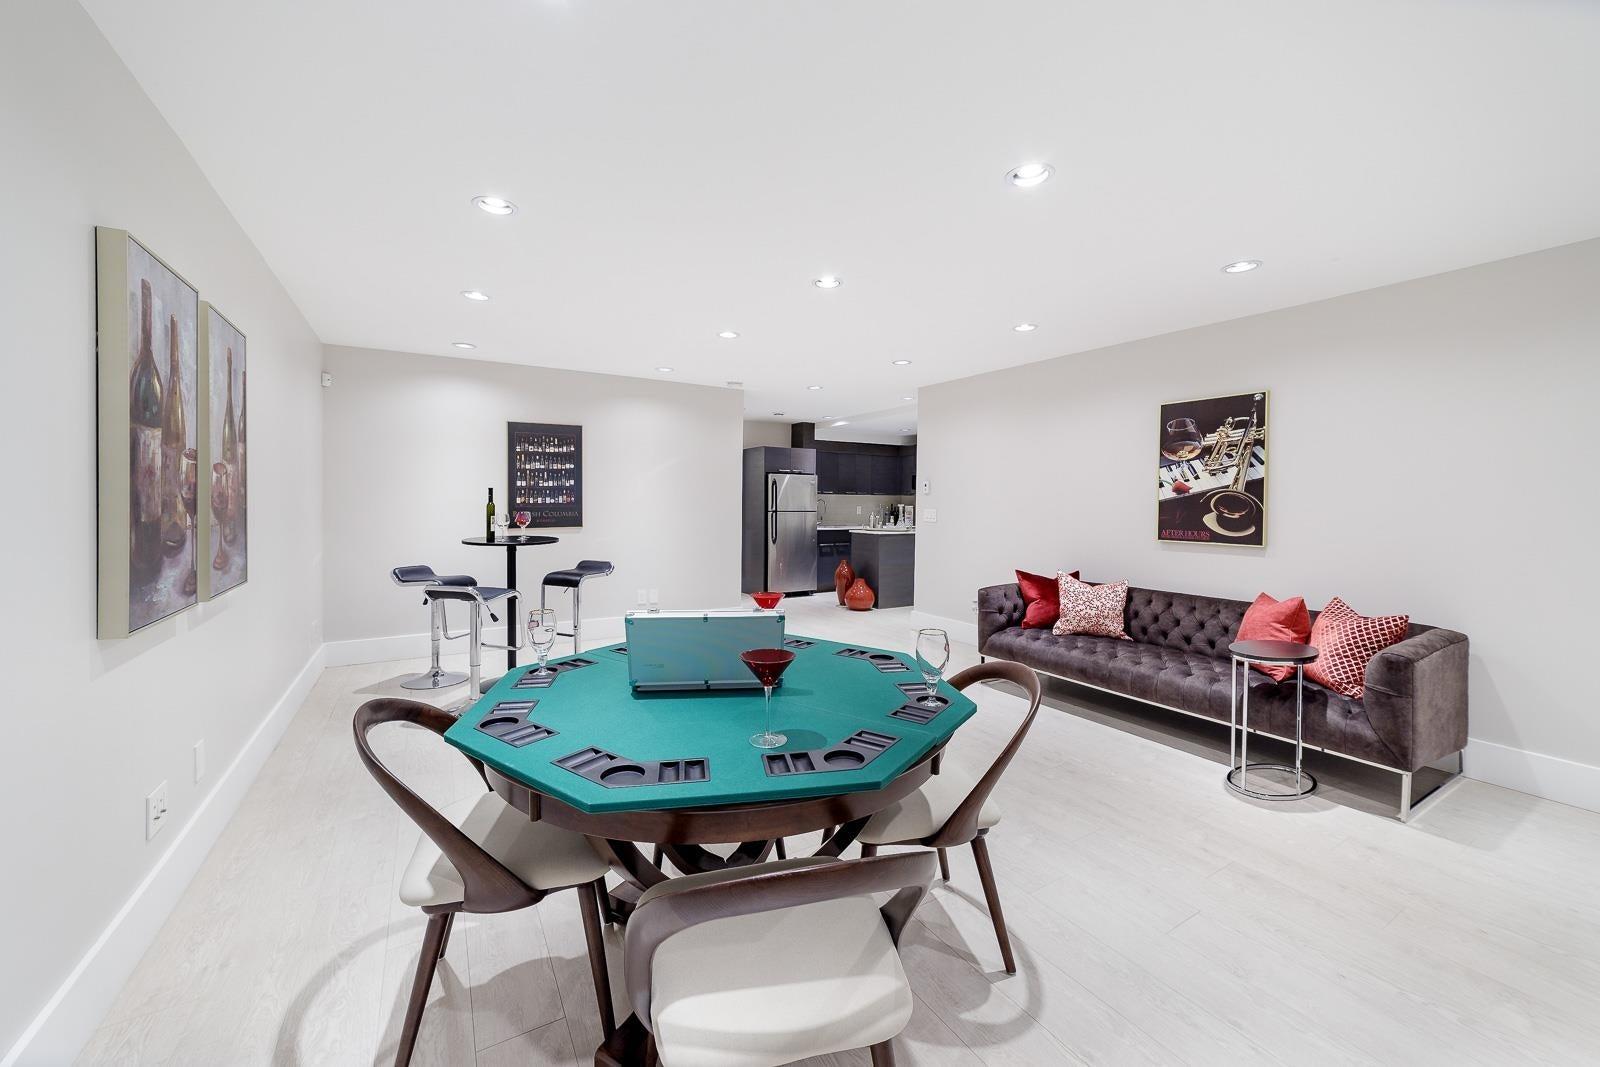 517 GRANADA CRESCENT - Upper Delbrook House/Single Family for sale, 8 Bedrooms (R2615057) - #26